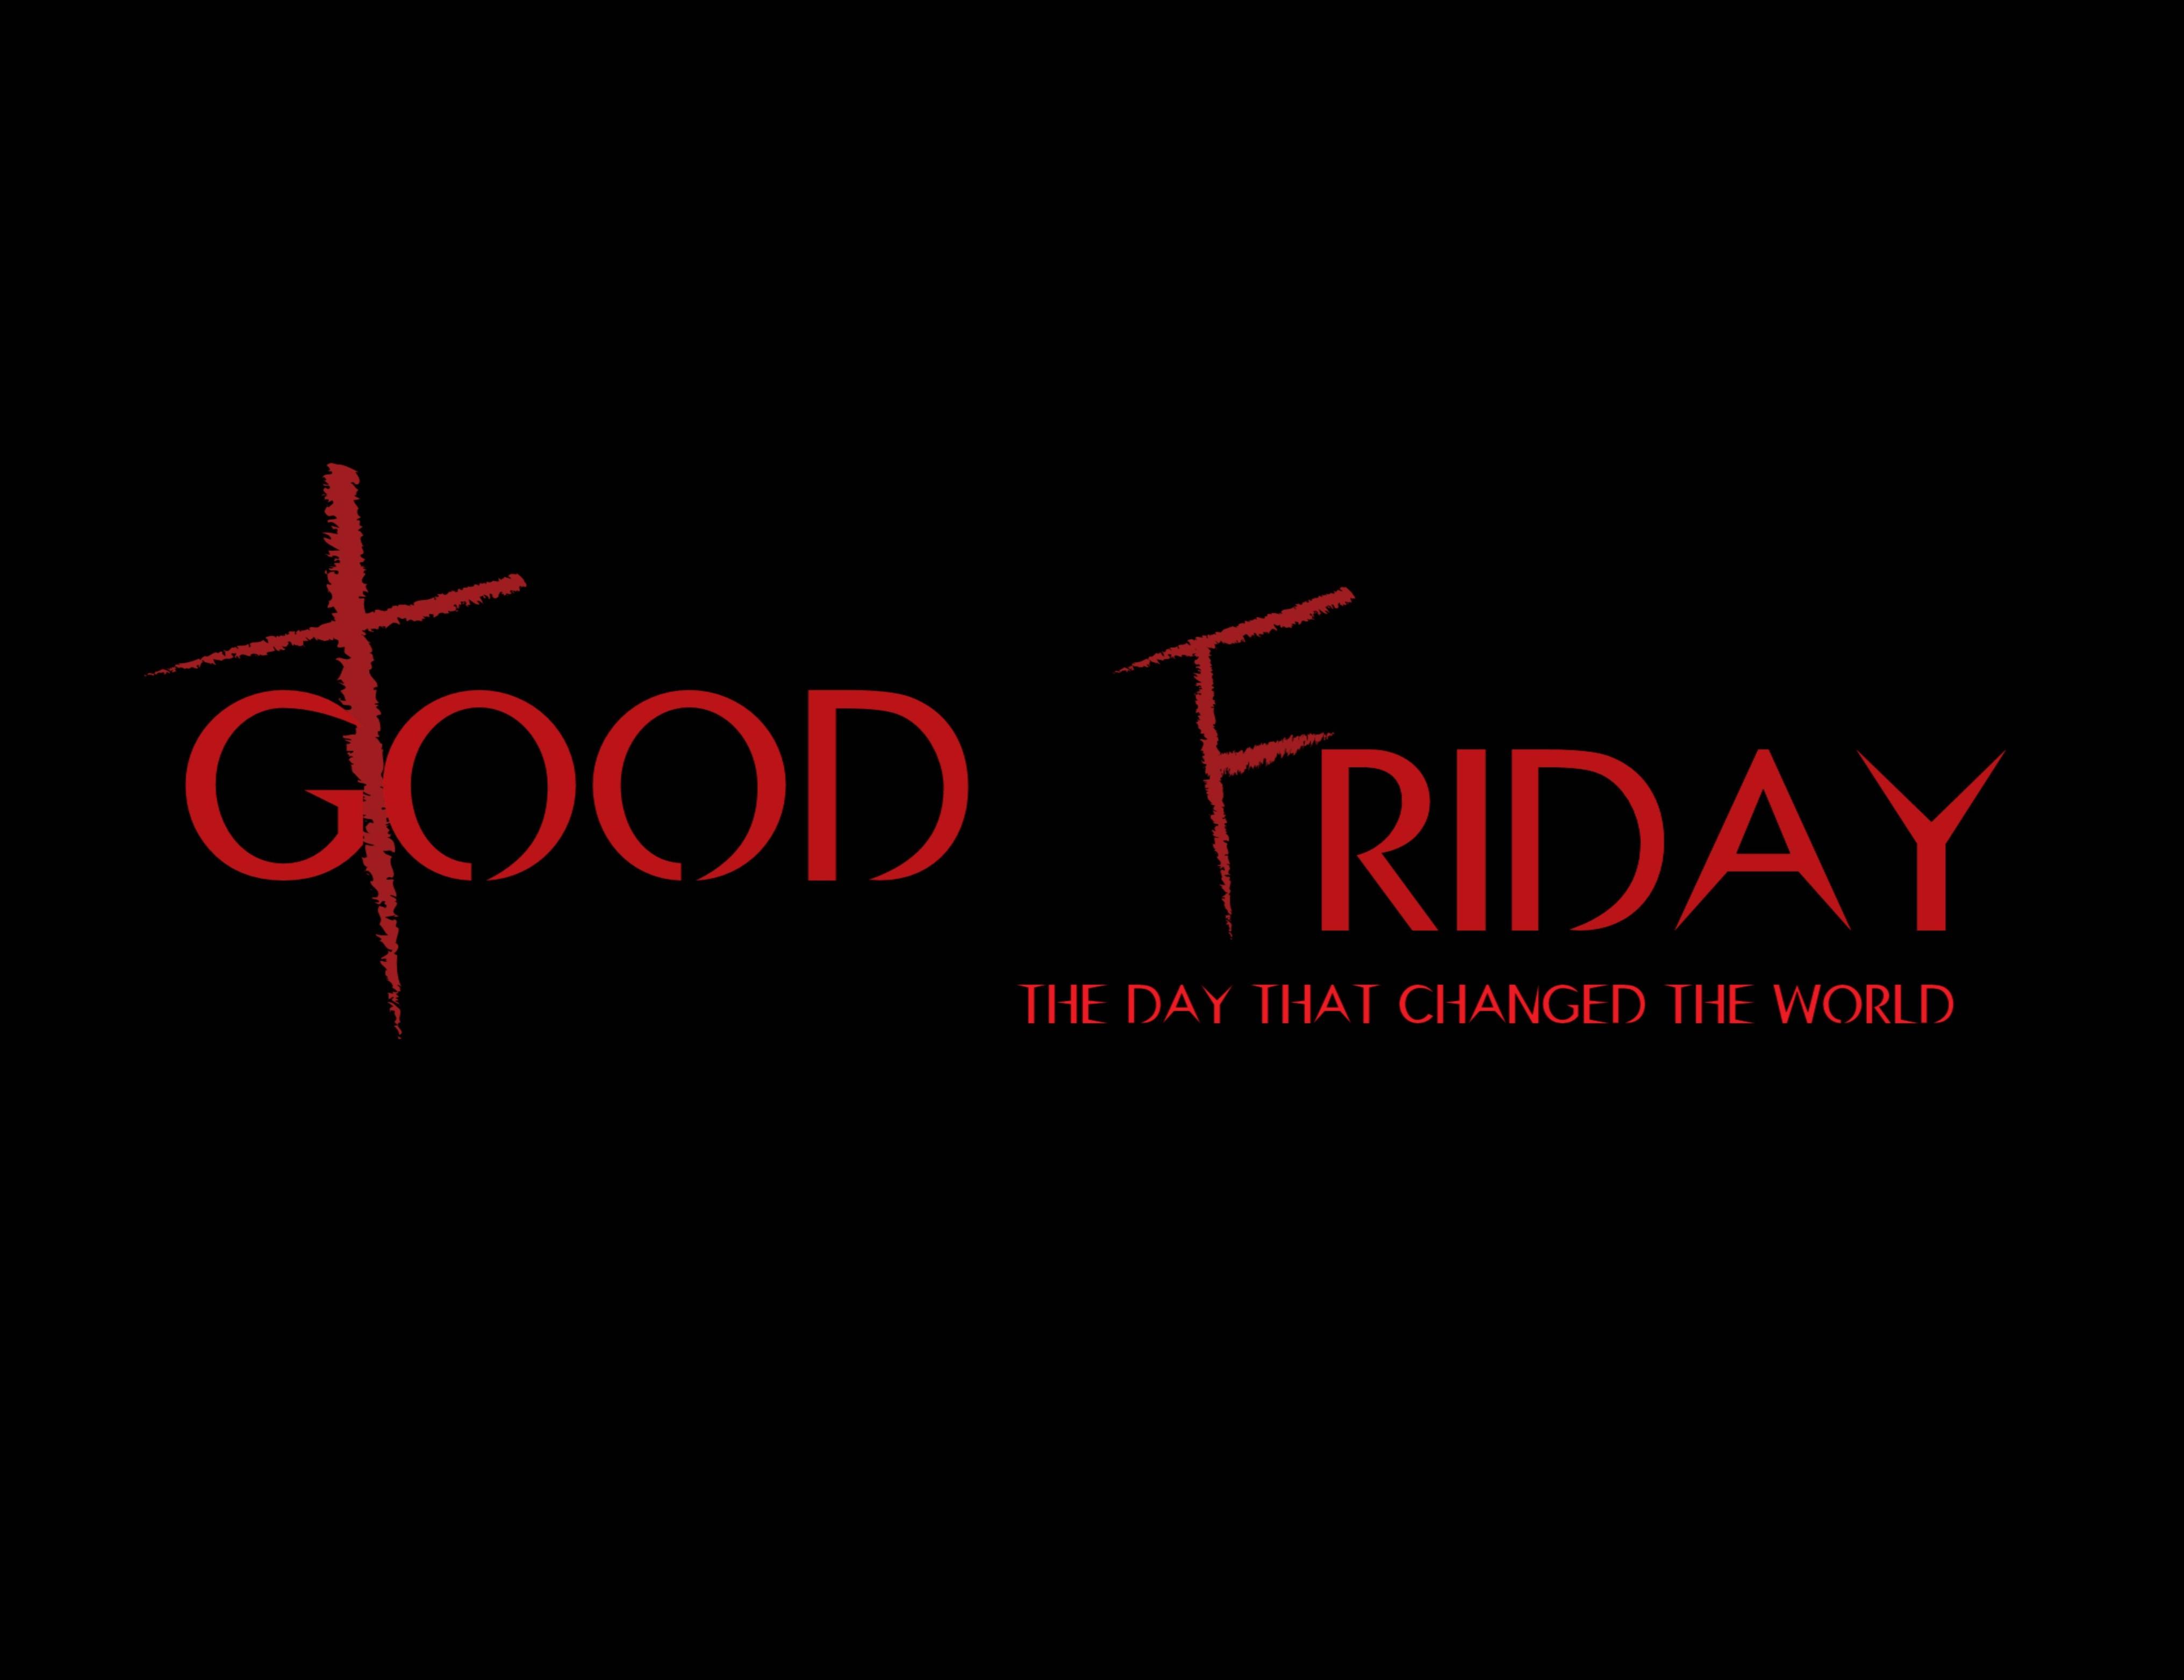 Good Friday Wallpapers | 4063 x 3125 jpeg 305kB